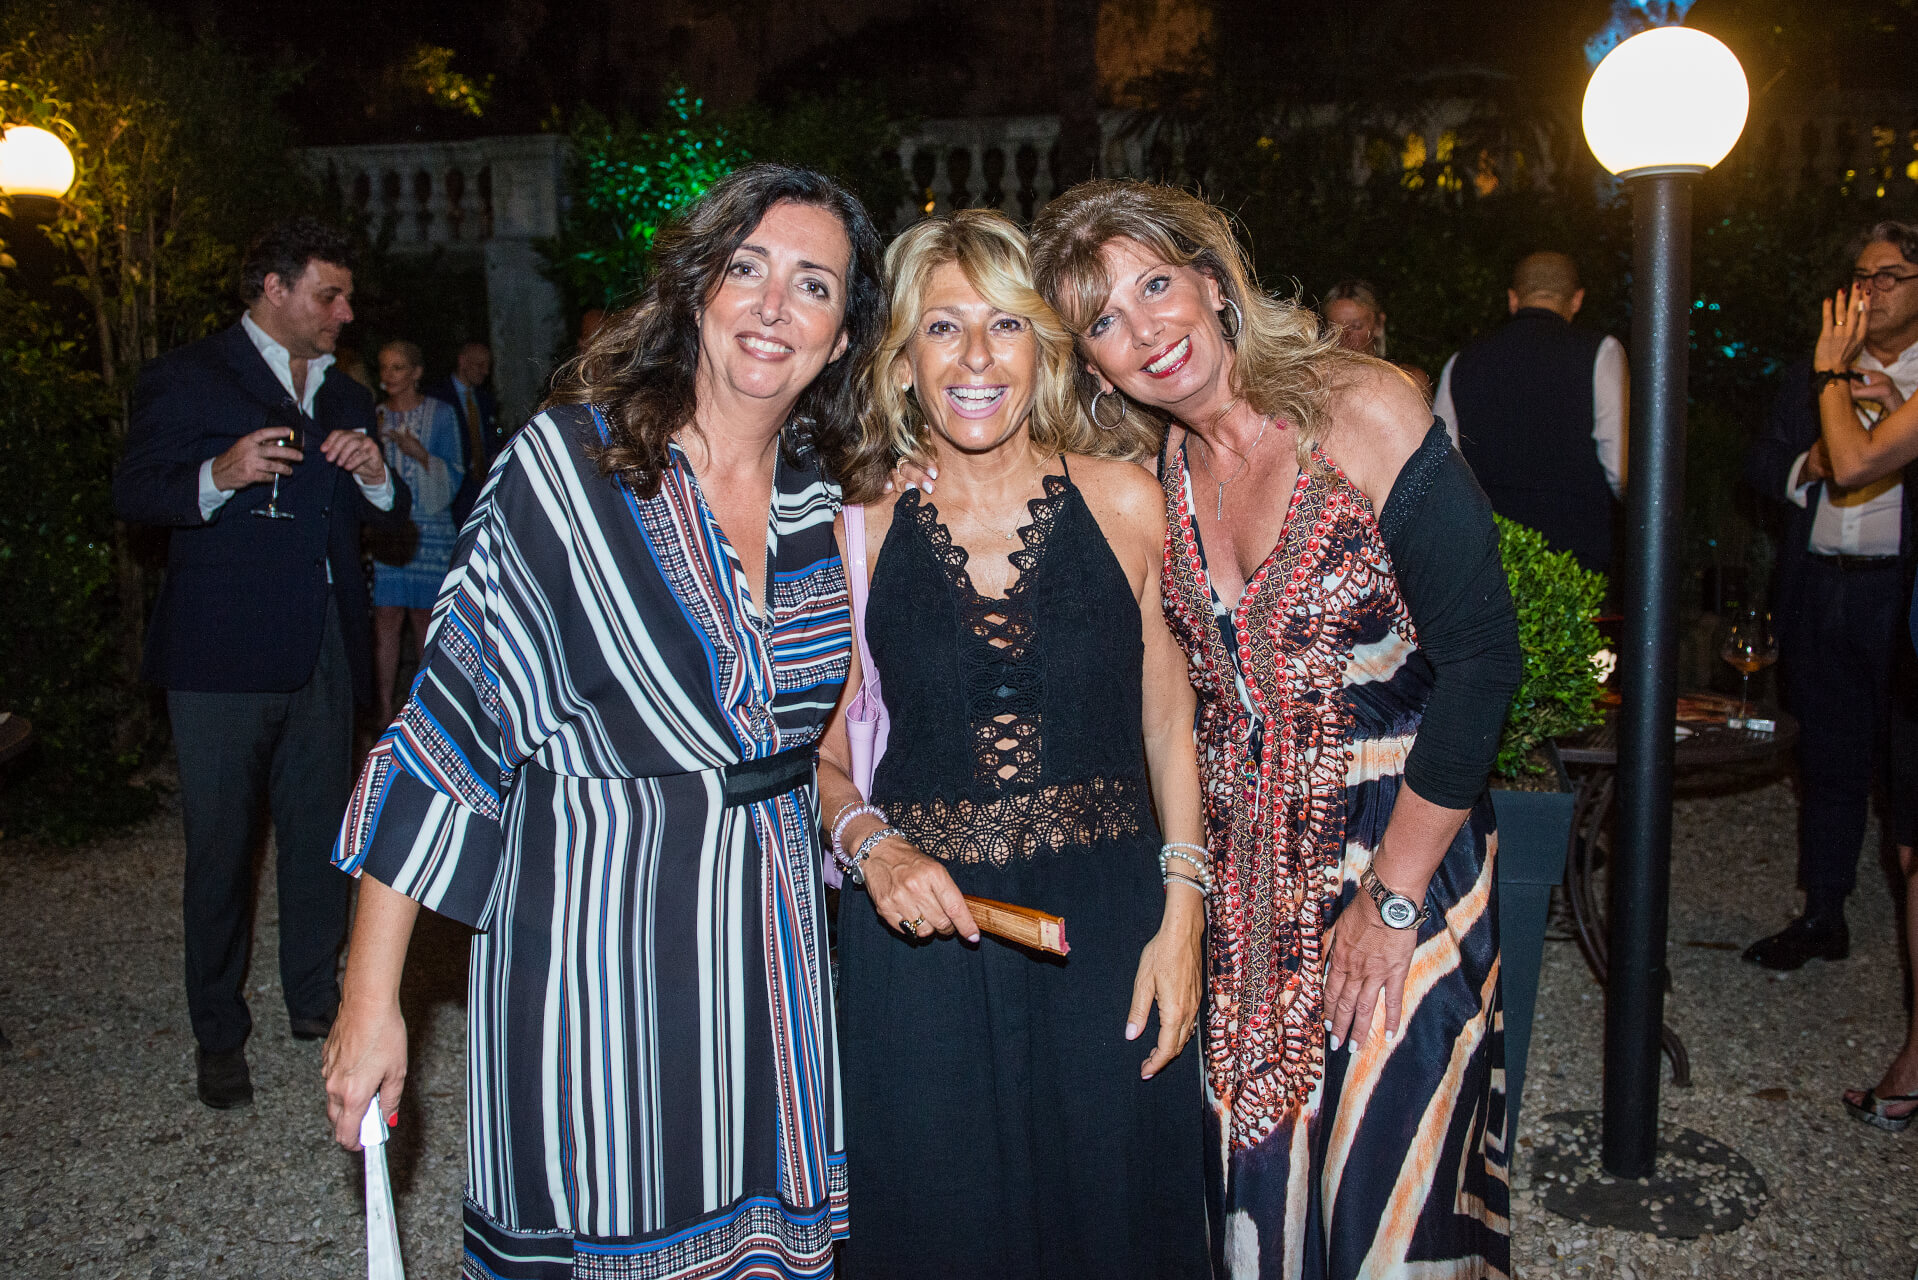 Michela Minasi, Paola Paciotti, Alessandra Amati